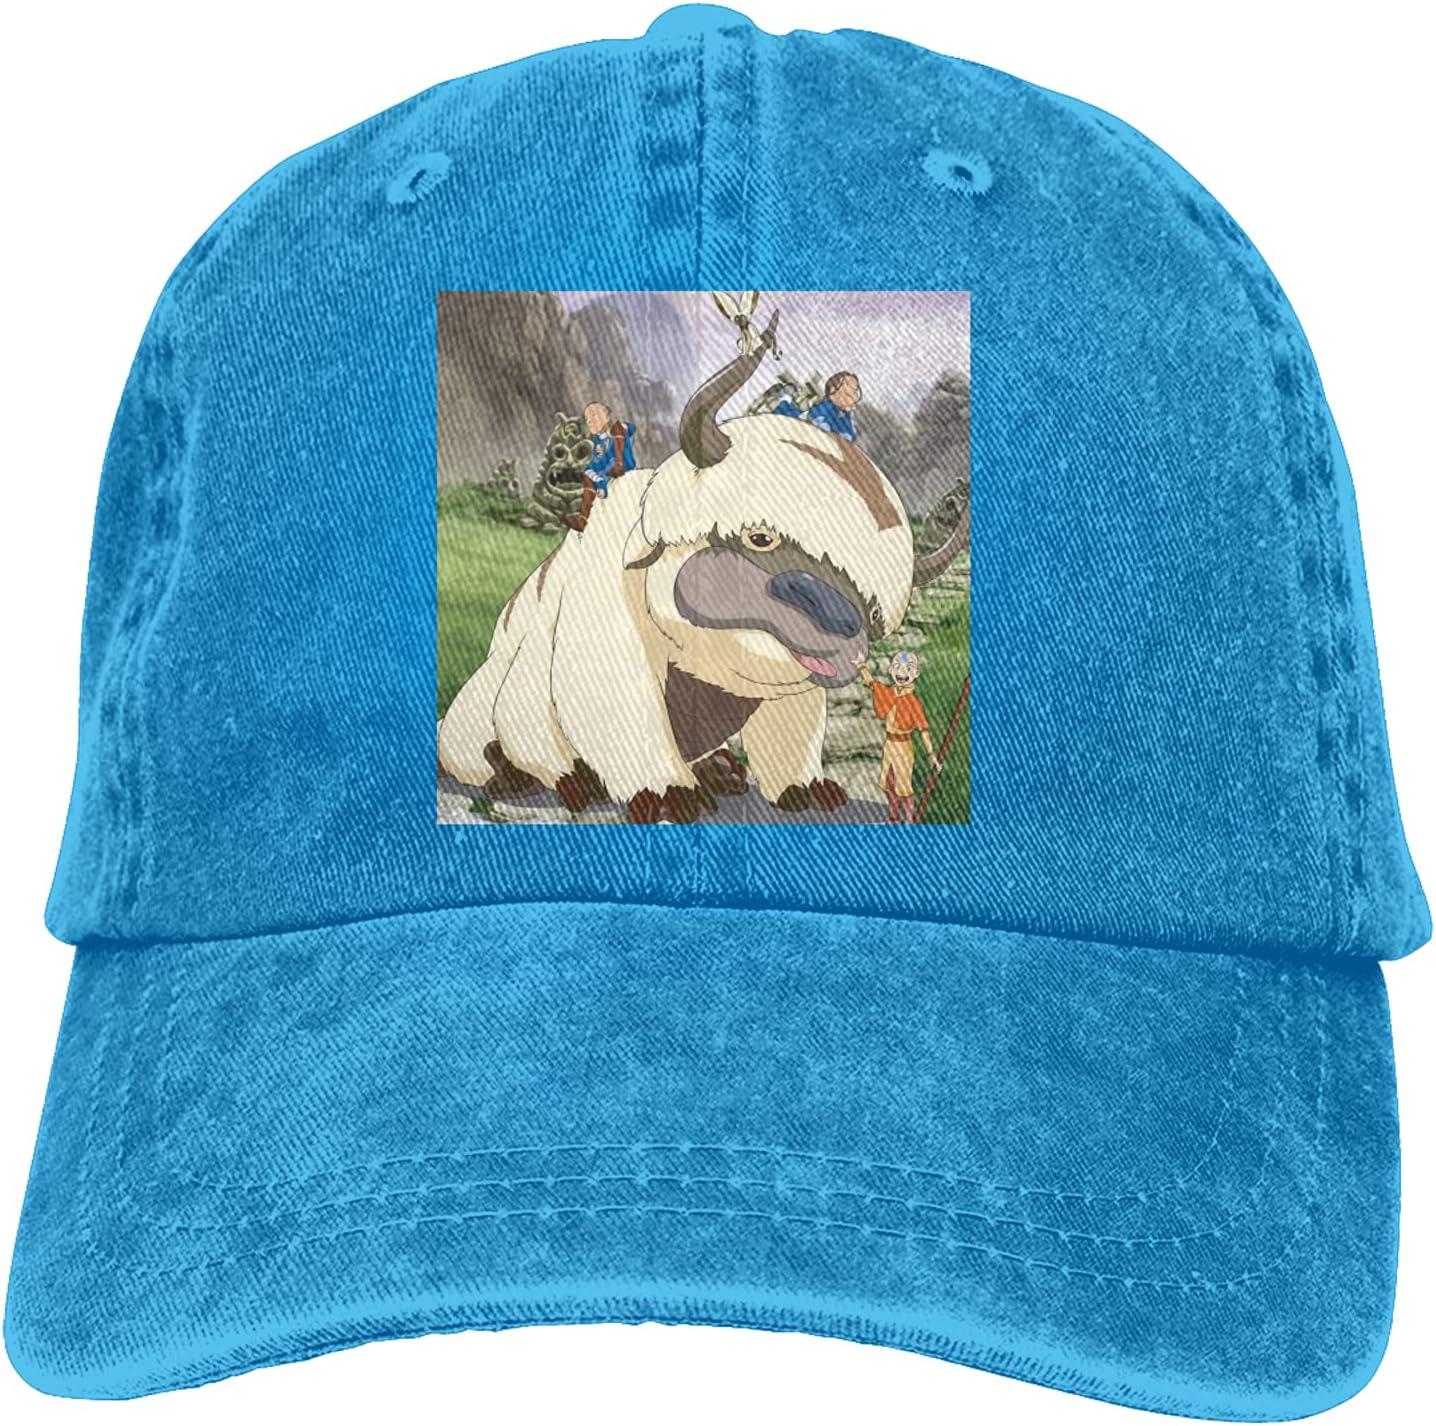 Avatar The Last Airbender Cowboy Hat Unisex Adjustable Hat Circumference Size Pure Cotton Denim Wash Water Outdoor